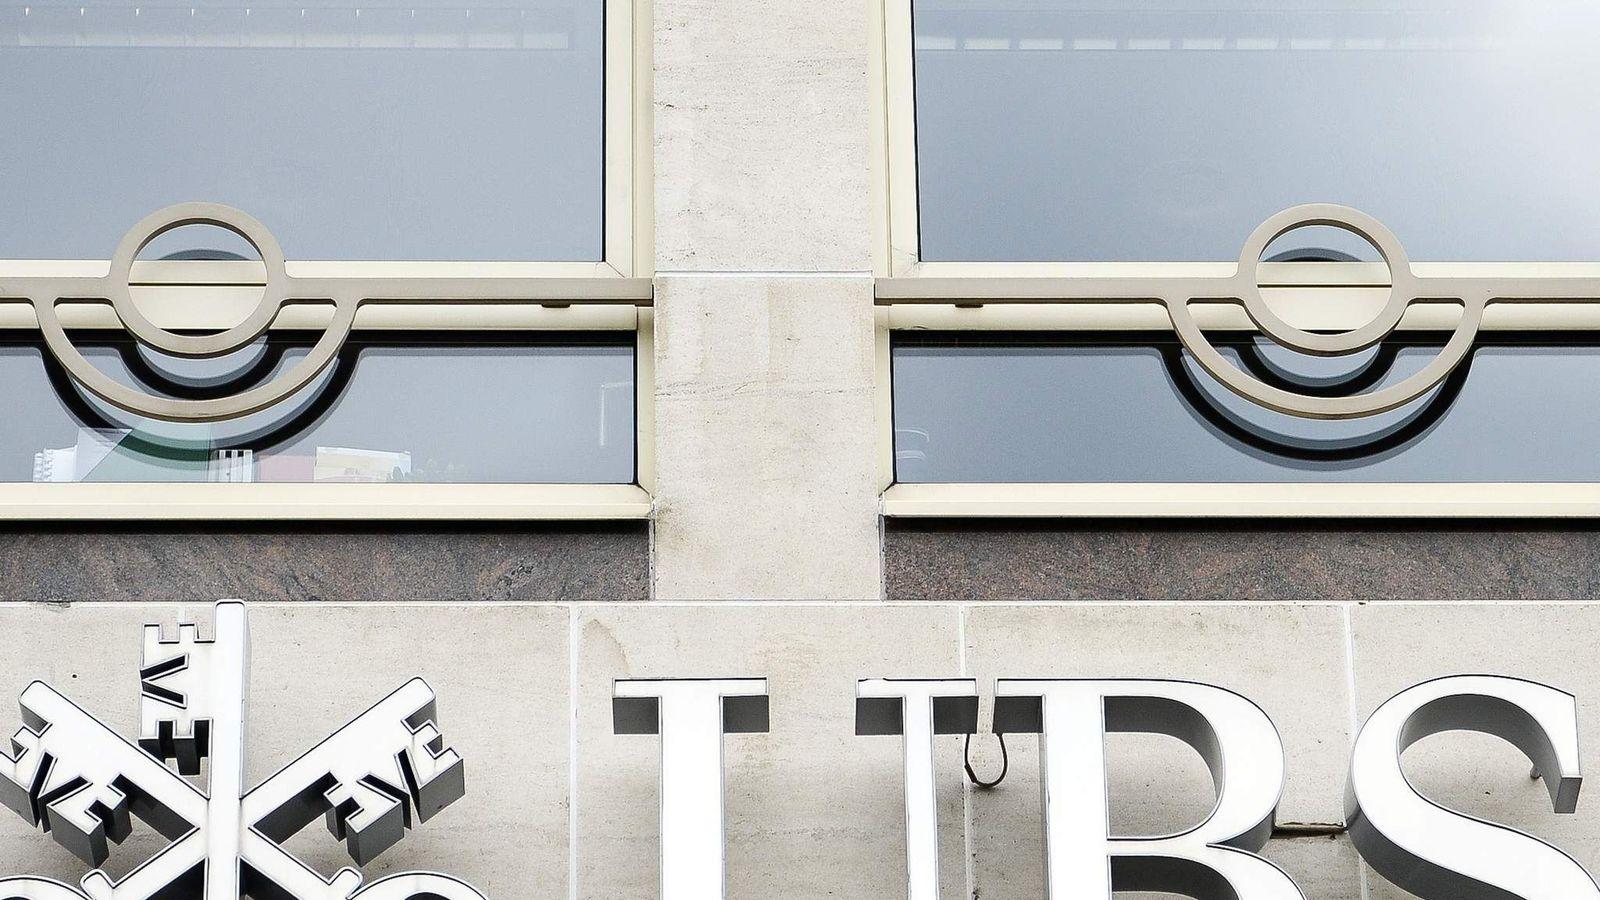 UBS scales down Brexit exodus scenario | Business News | Sky